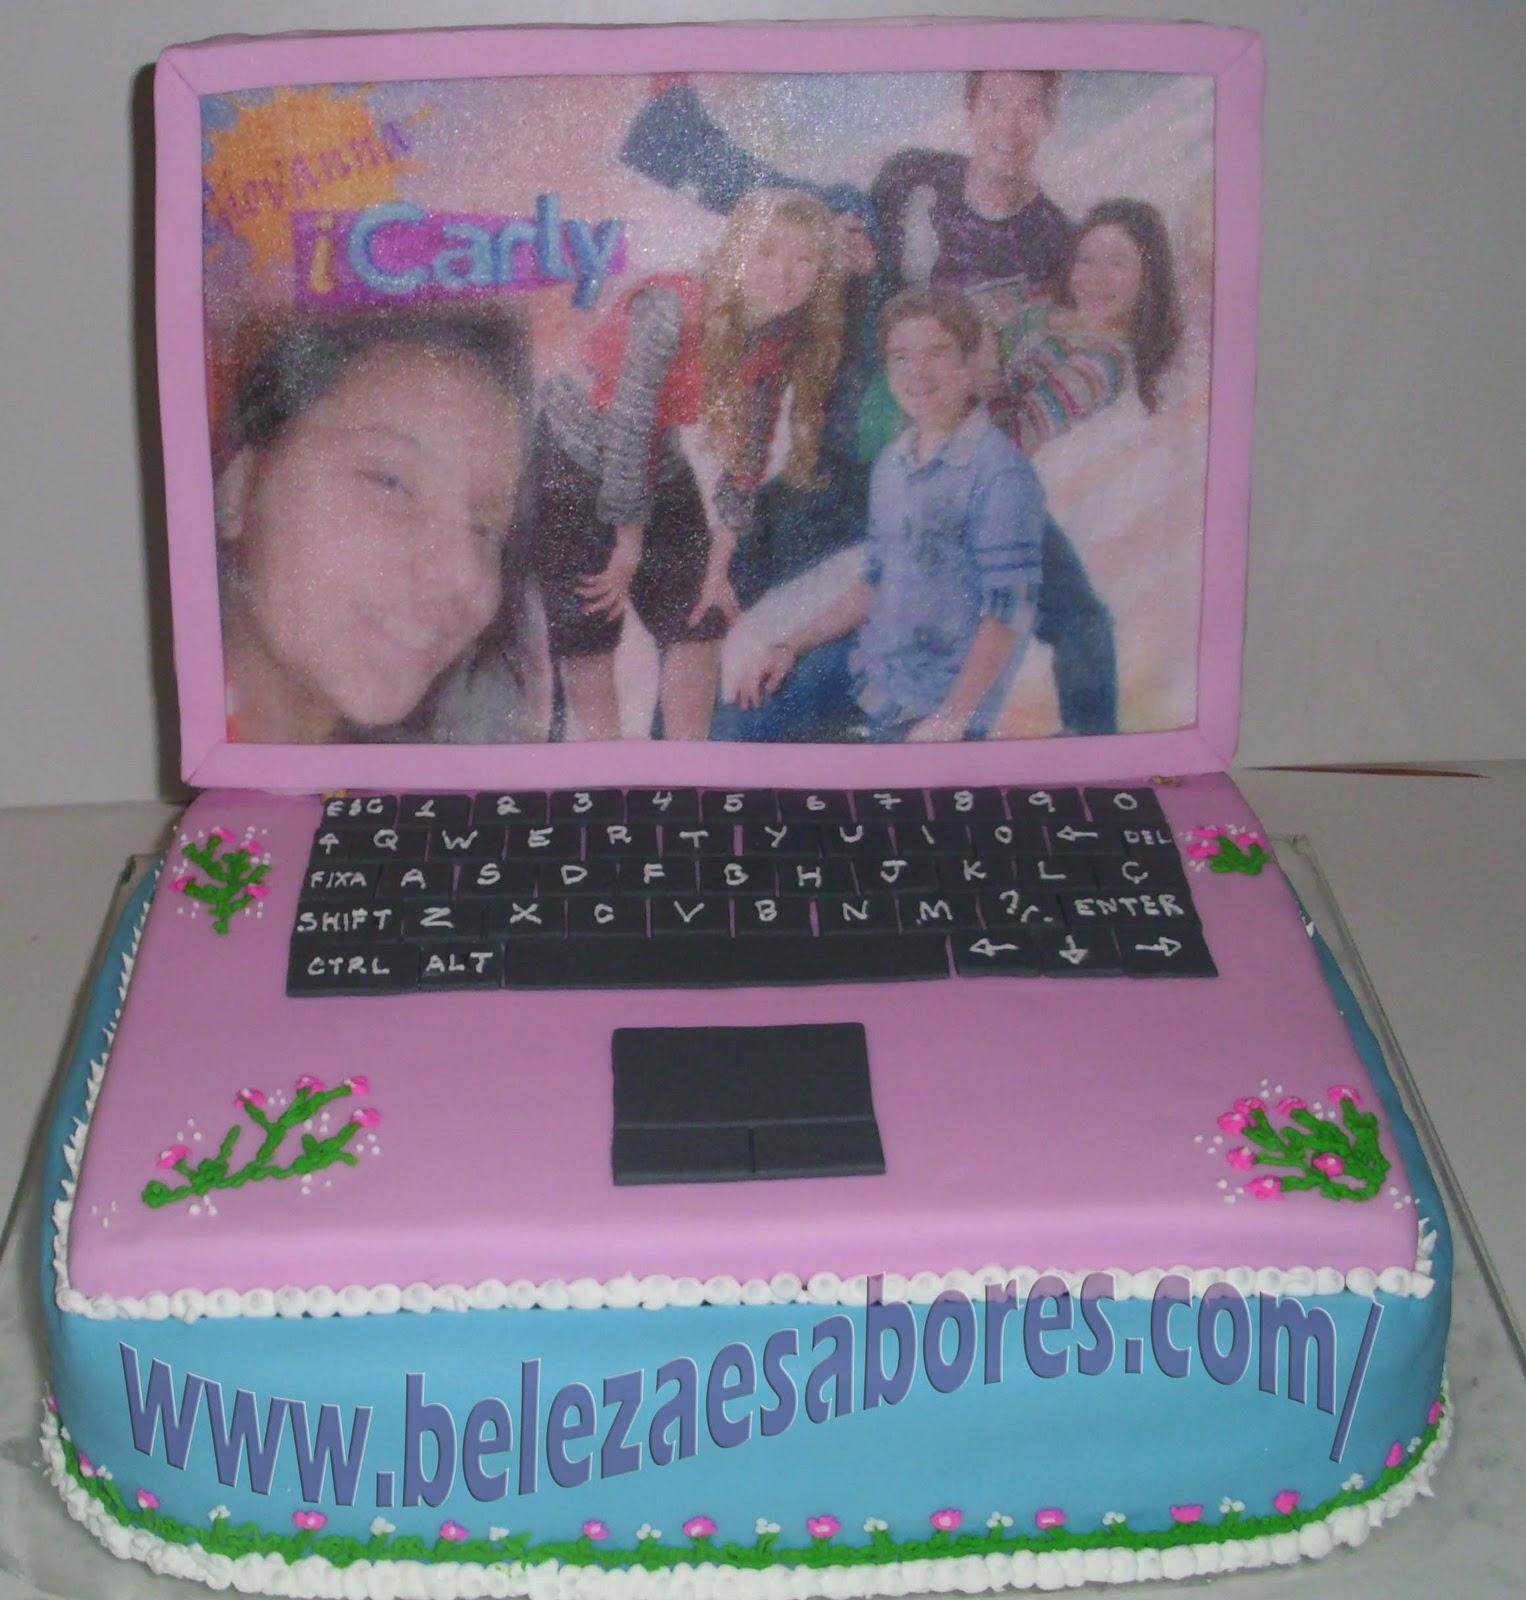 Popularmmos Cake Shop